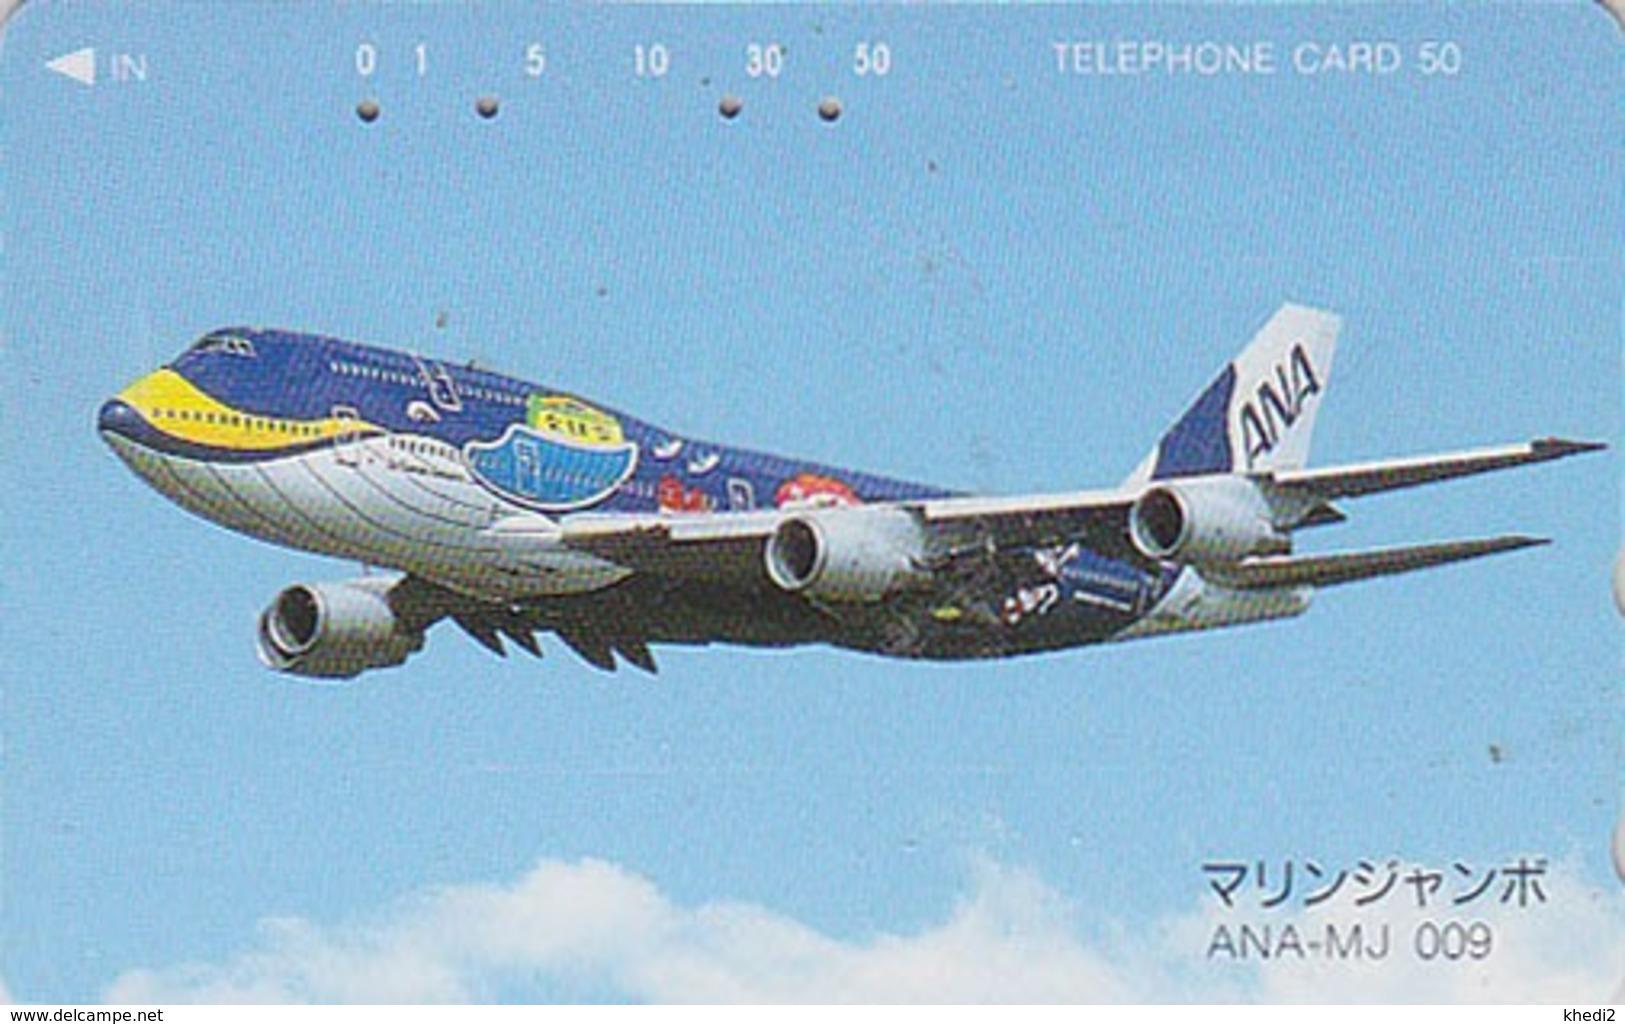 Télécarte Japon / 110-011 - AVION - ANA  ** MARINE JUMBO ** - PLANE Japan Phonecard - Aviation 2301 - Avions